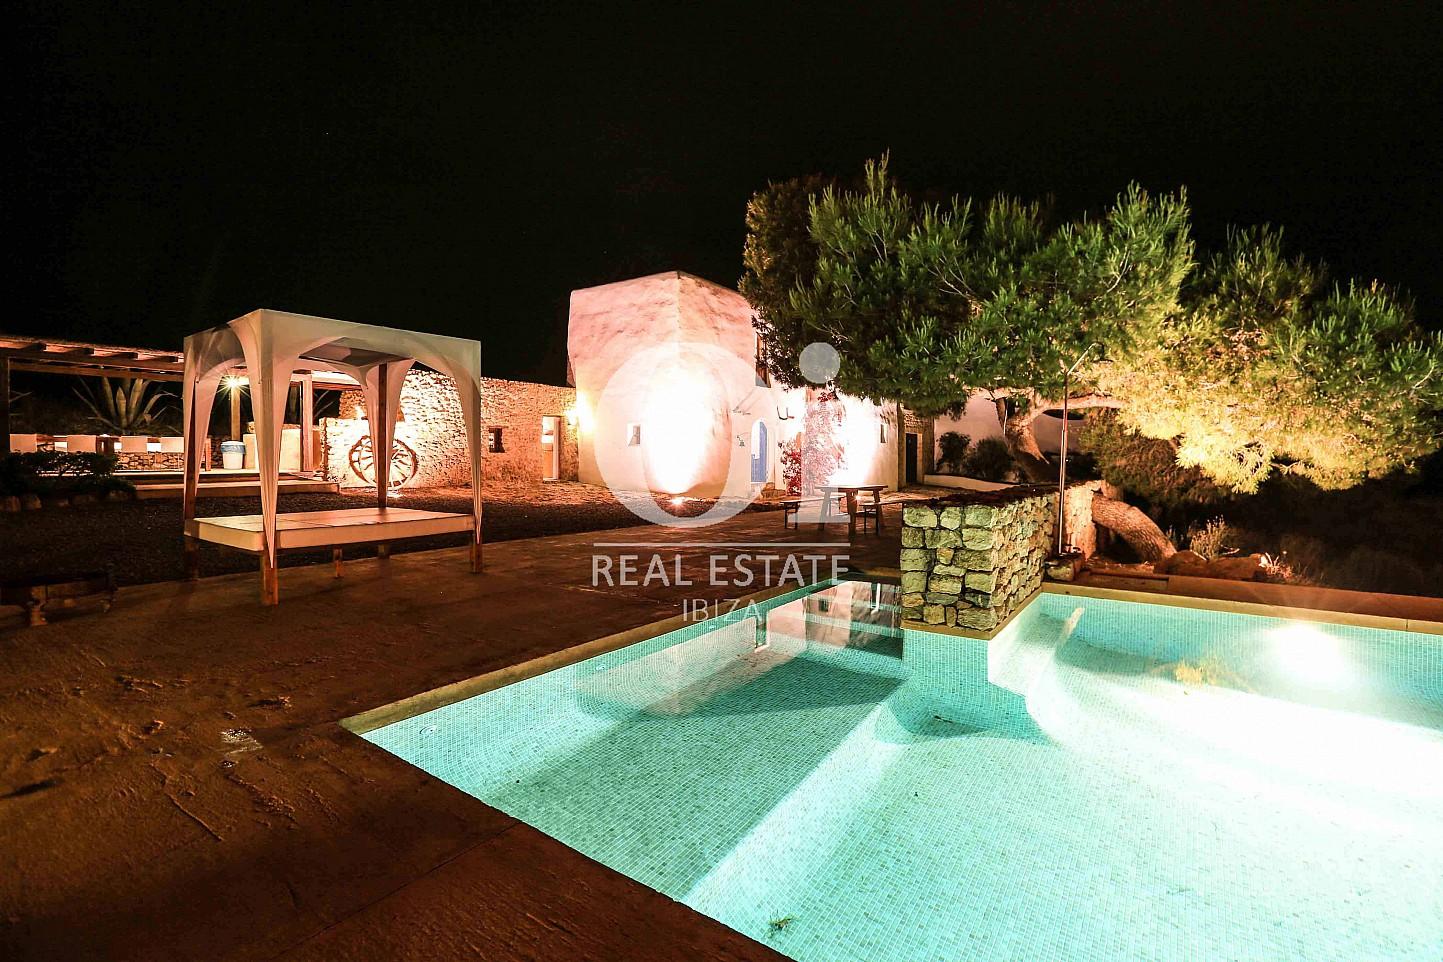 Vistas nocturnas de exteriores de casa de alquiler de estancia en Ibiza